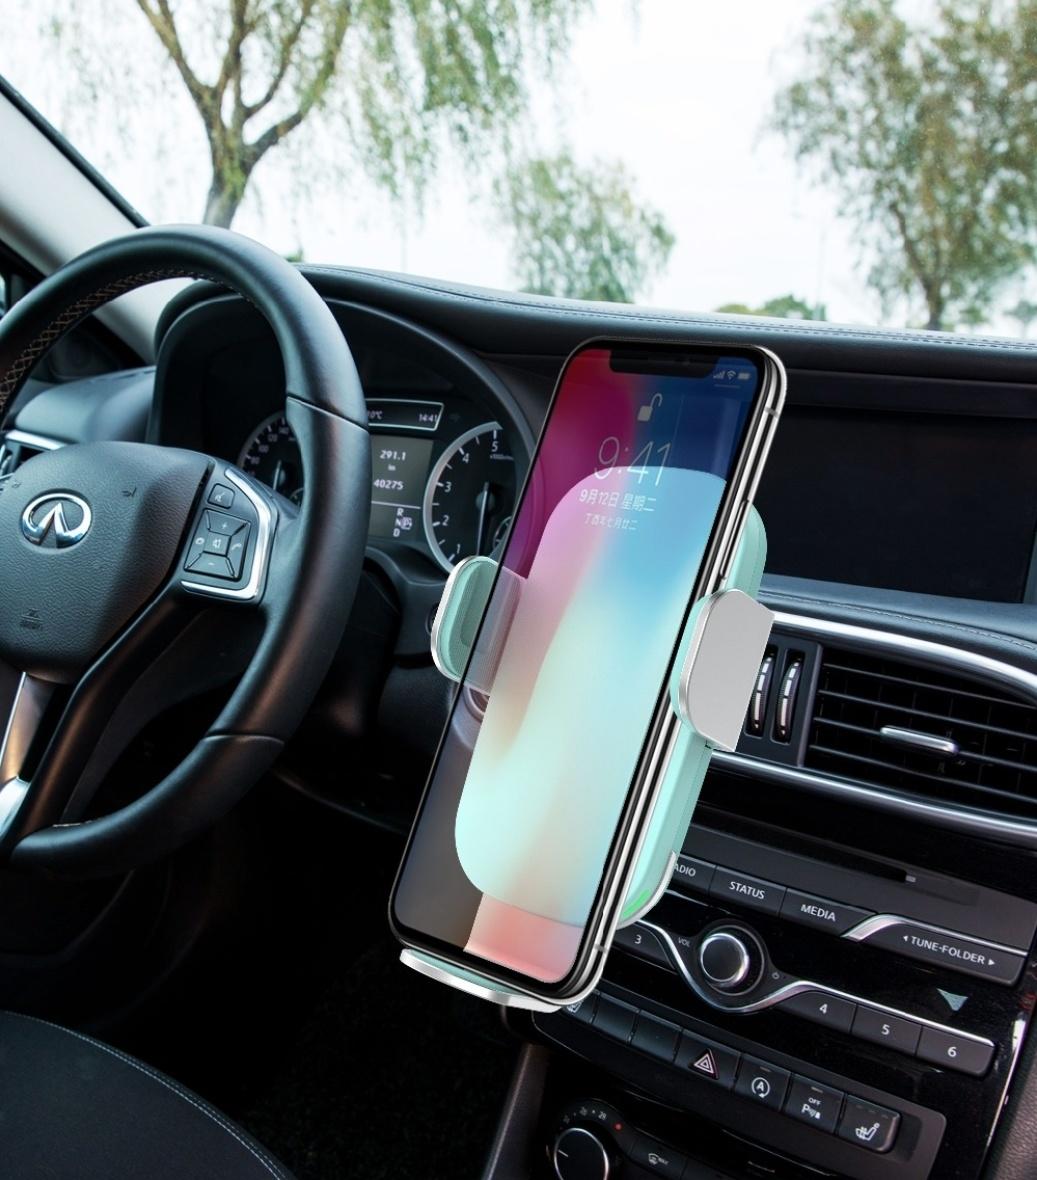 Stuff Certified® 15W Qi Draadloze Autolader Oplader Universeel 9V - 1.67A Wireless Car Charging Pad Blauw